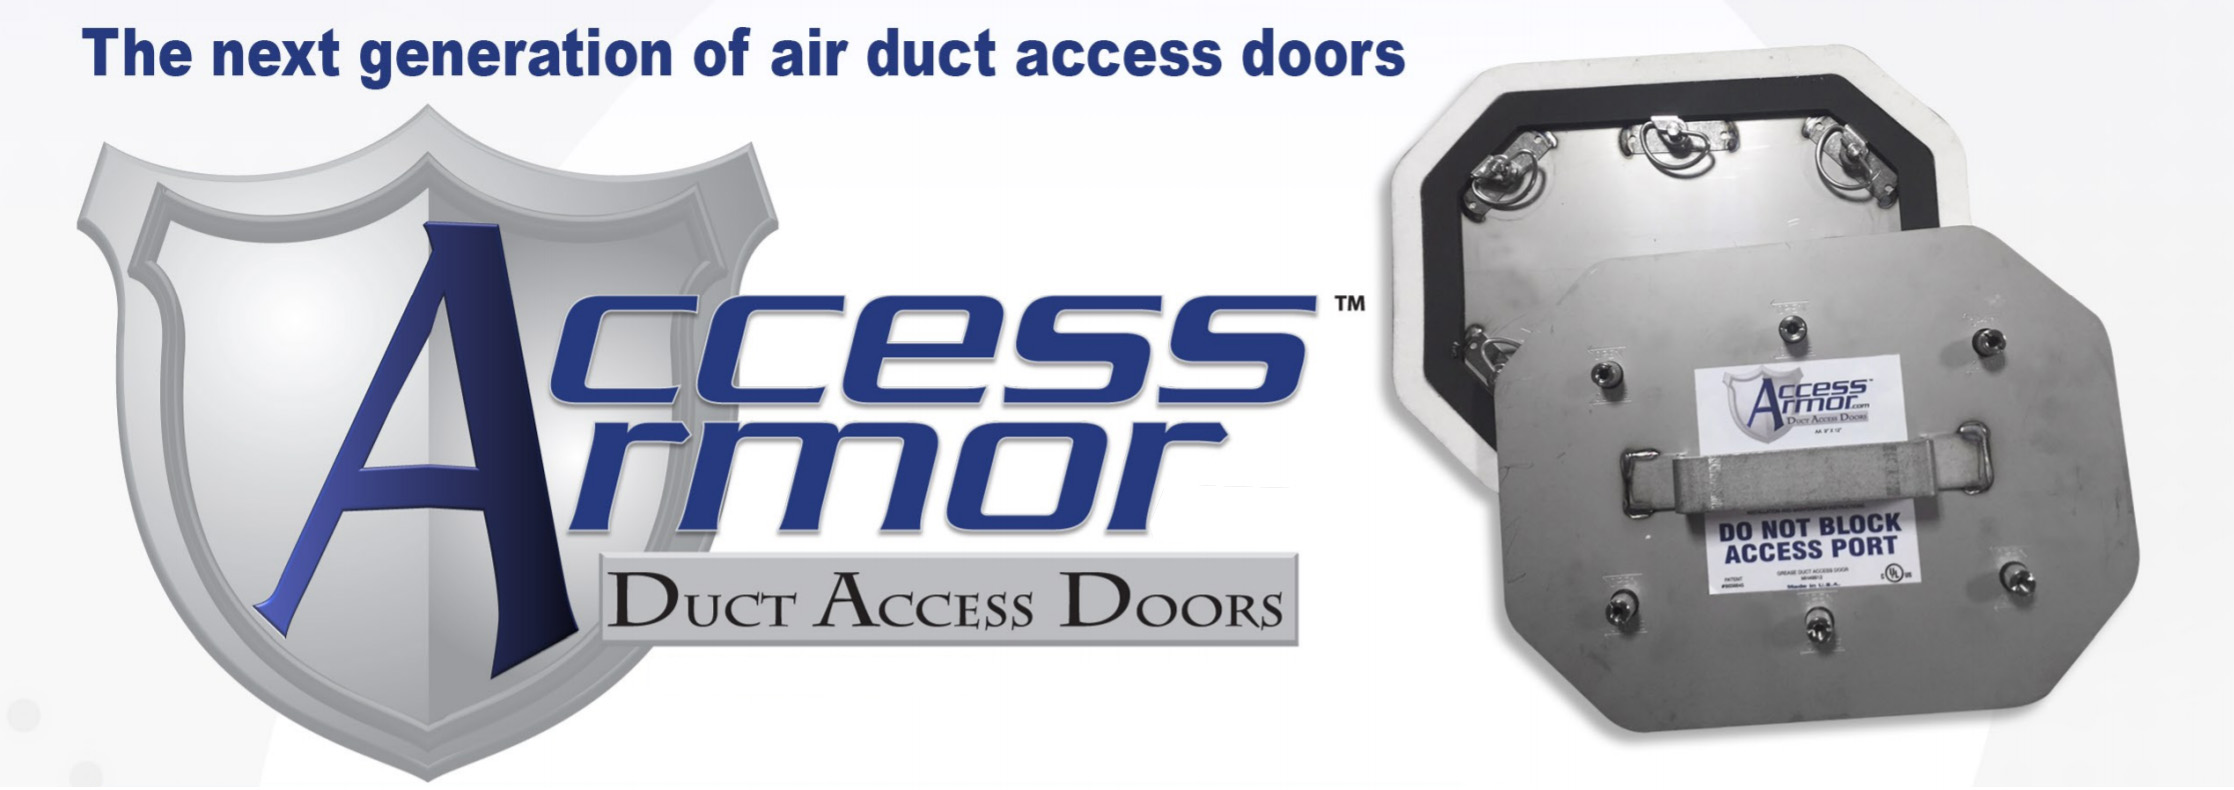 Access Armor